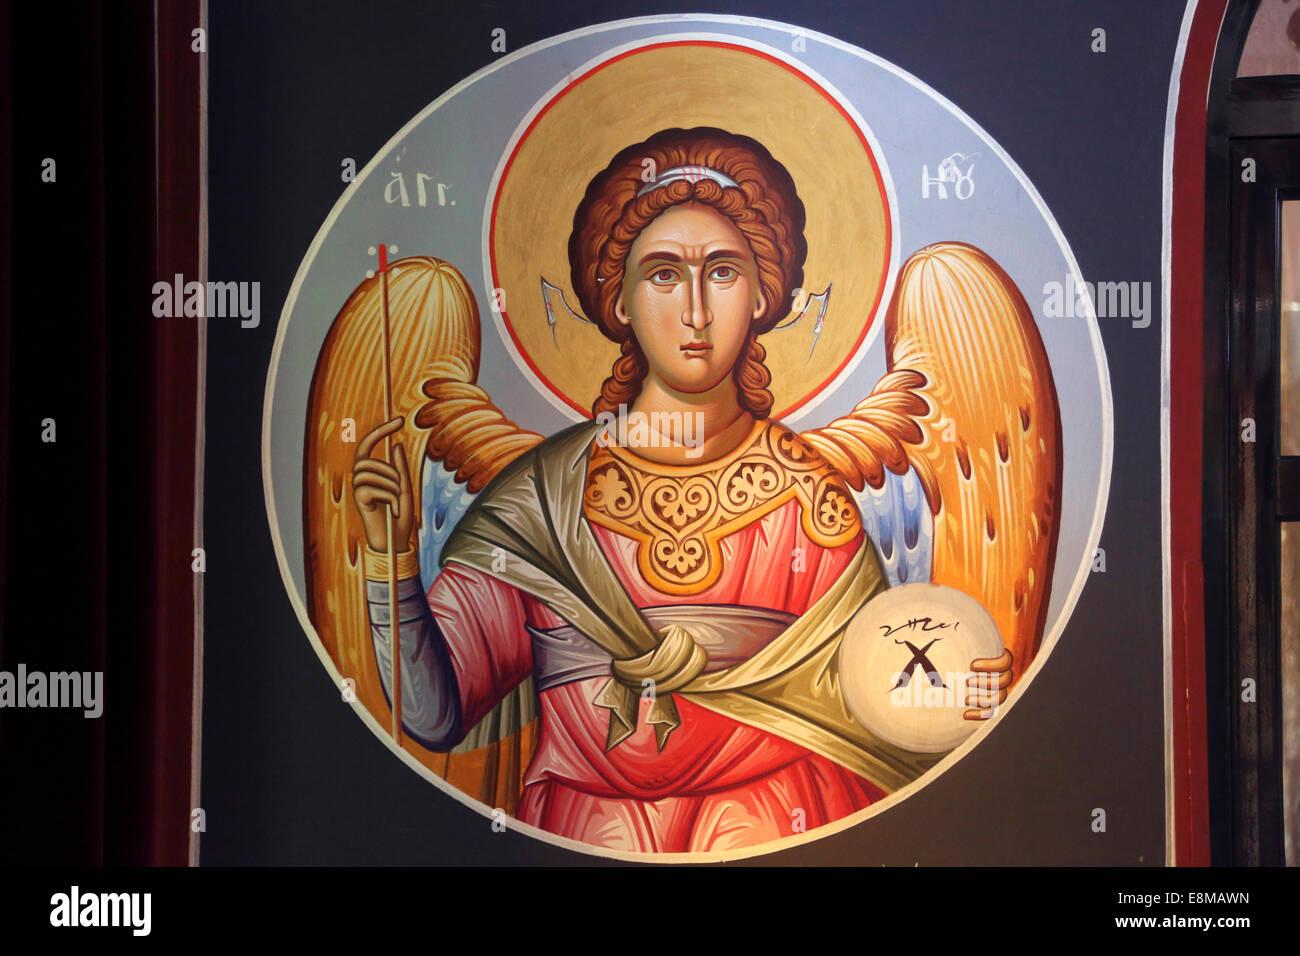 Halkidha Evia Greece Church of Saint Marina Archangel Gabriel - Stock Image